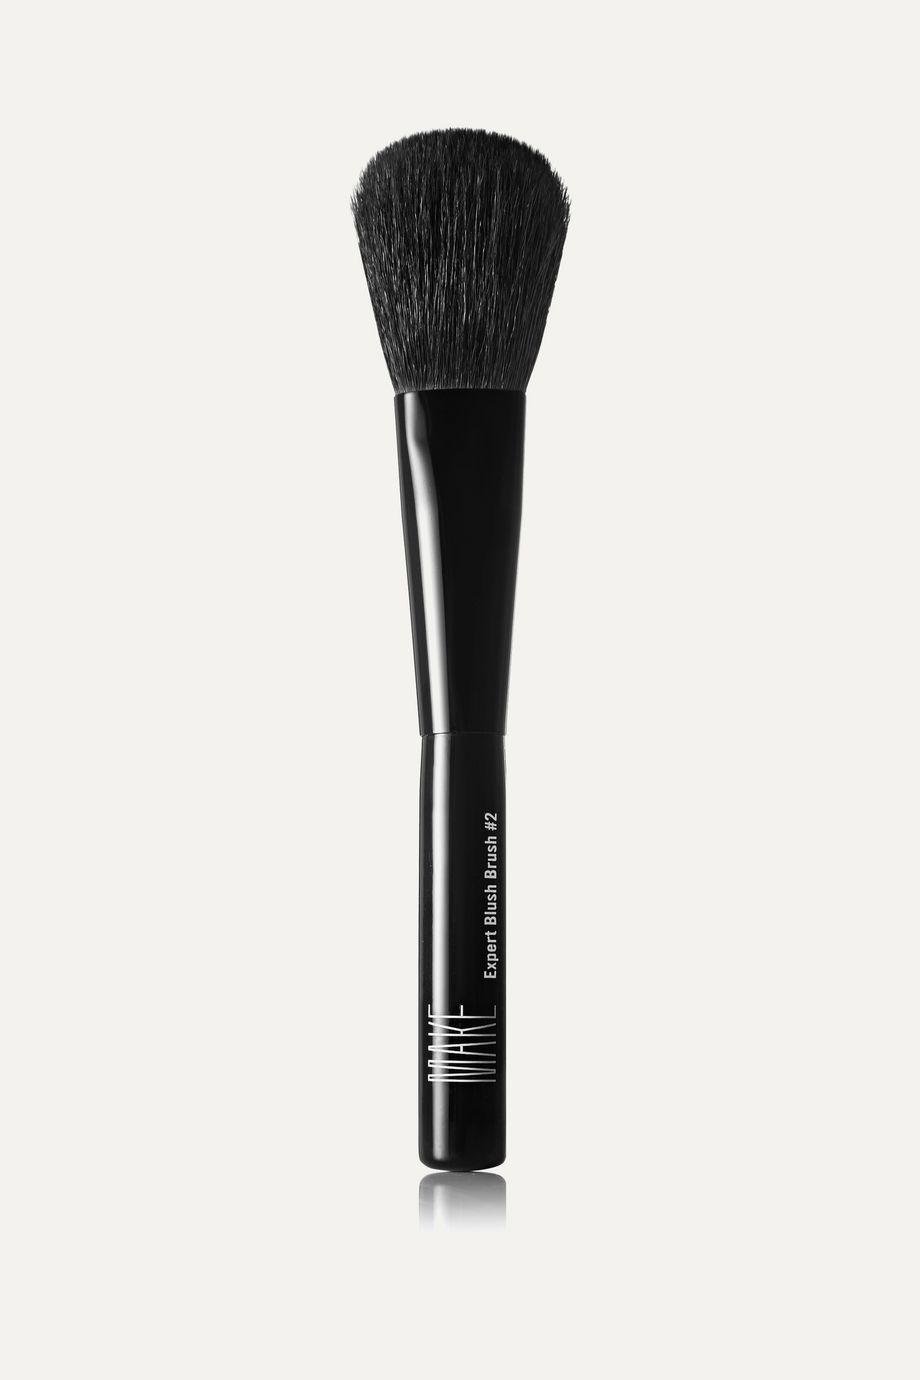 MAKE Beauty Expert Blush Brush #2